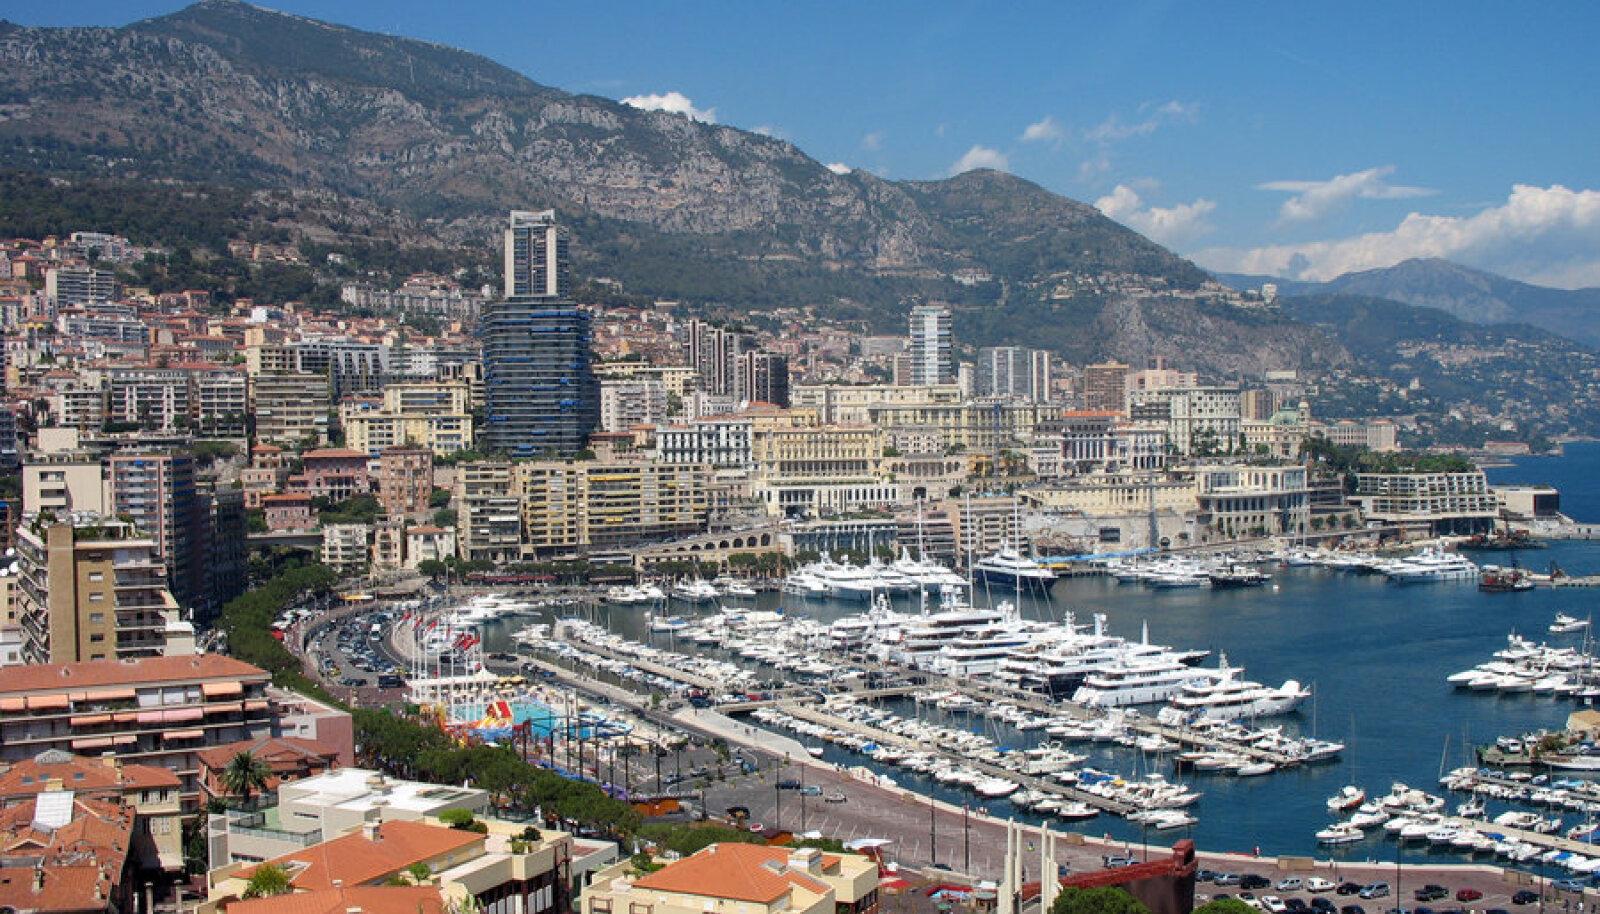 Monaco: jõukuse, aga ka maksuparadiisi sümbol.